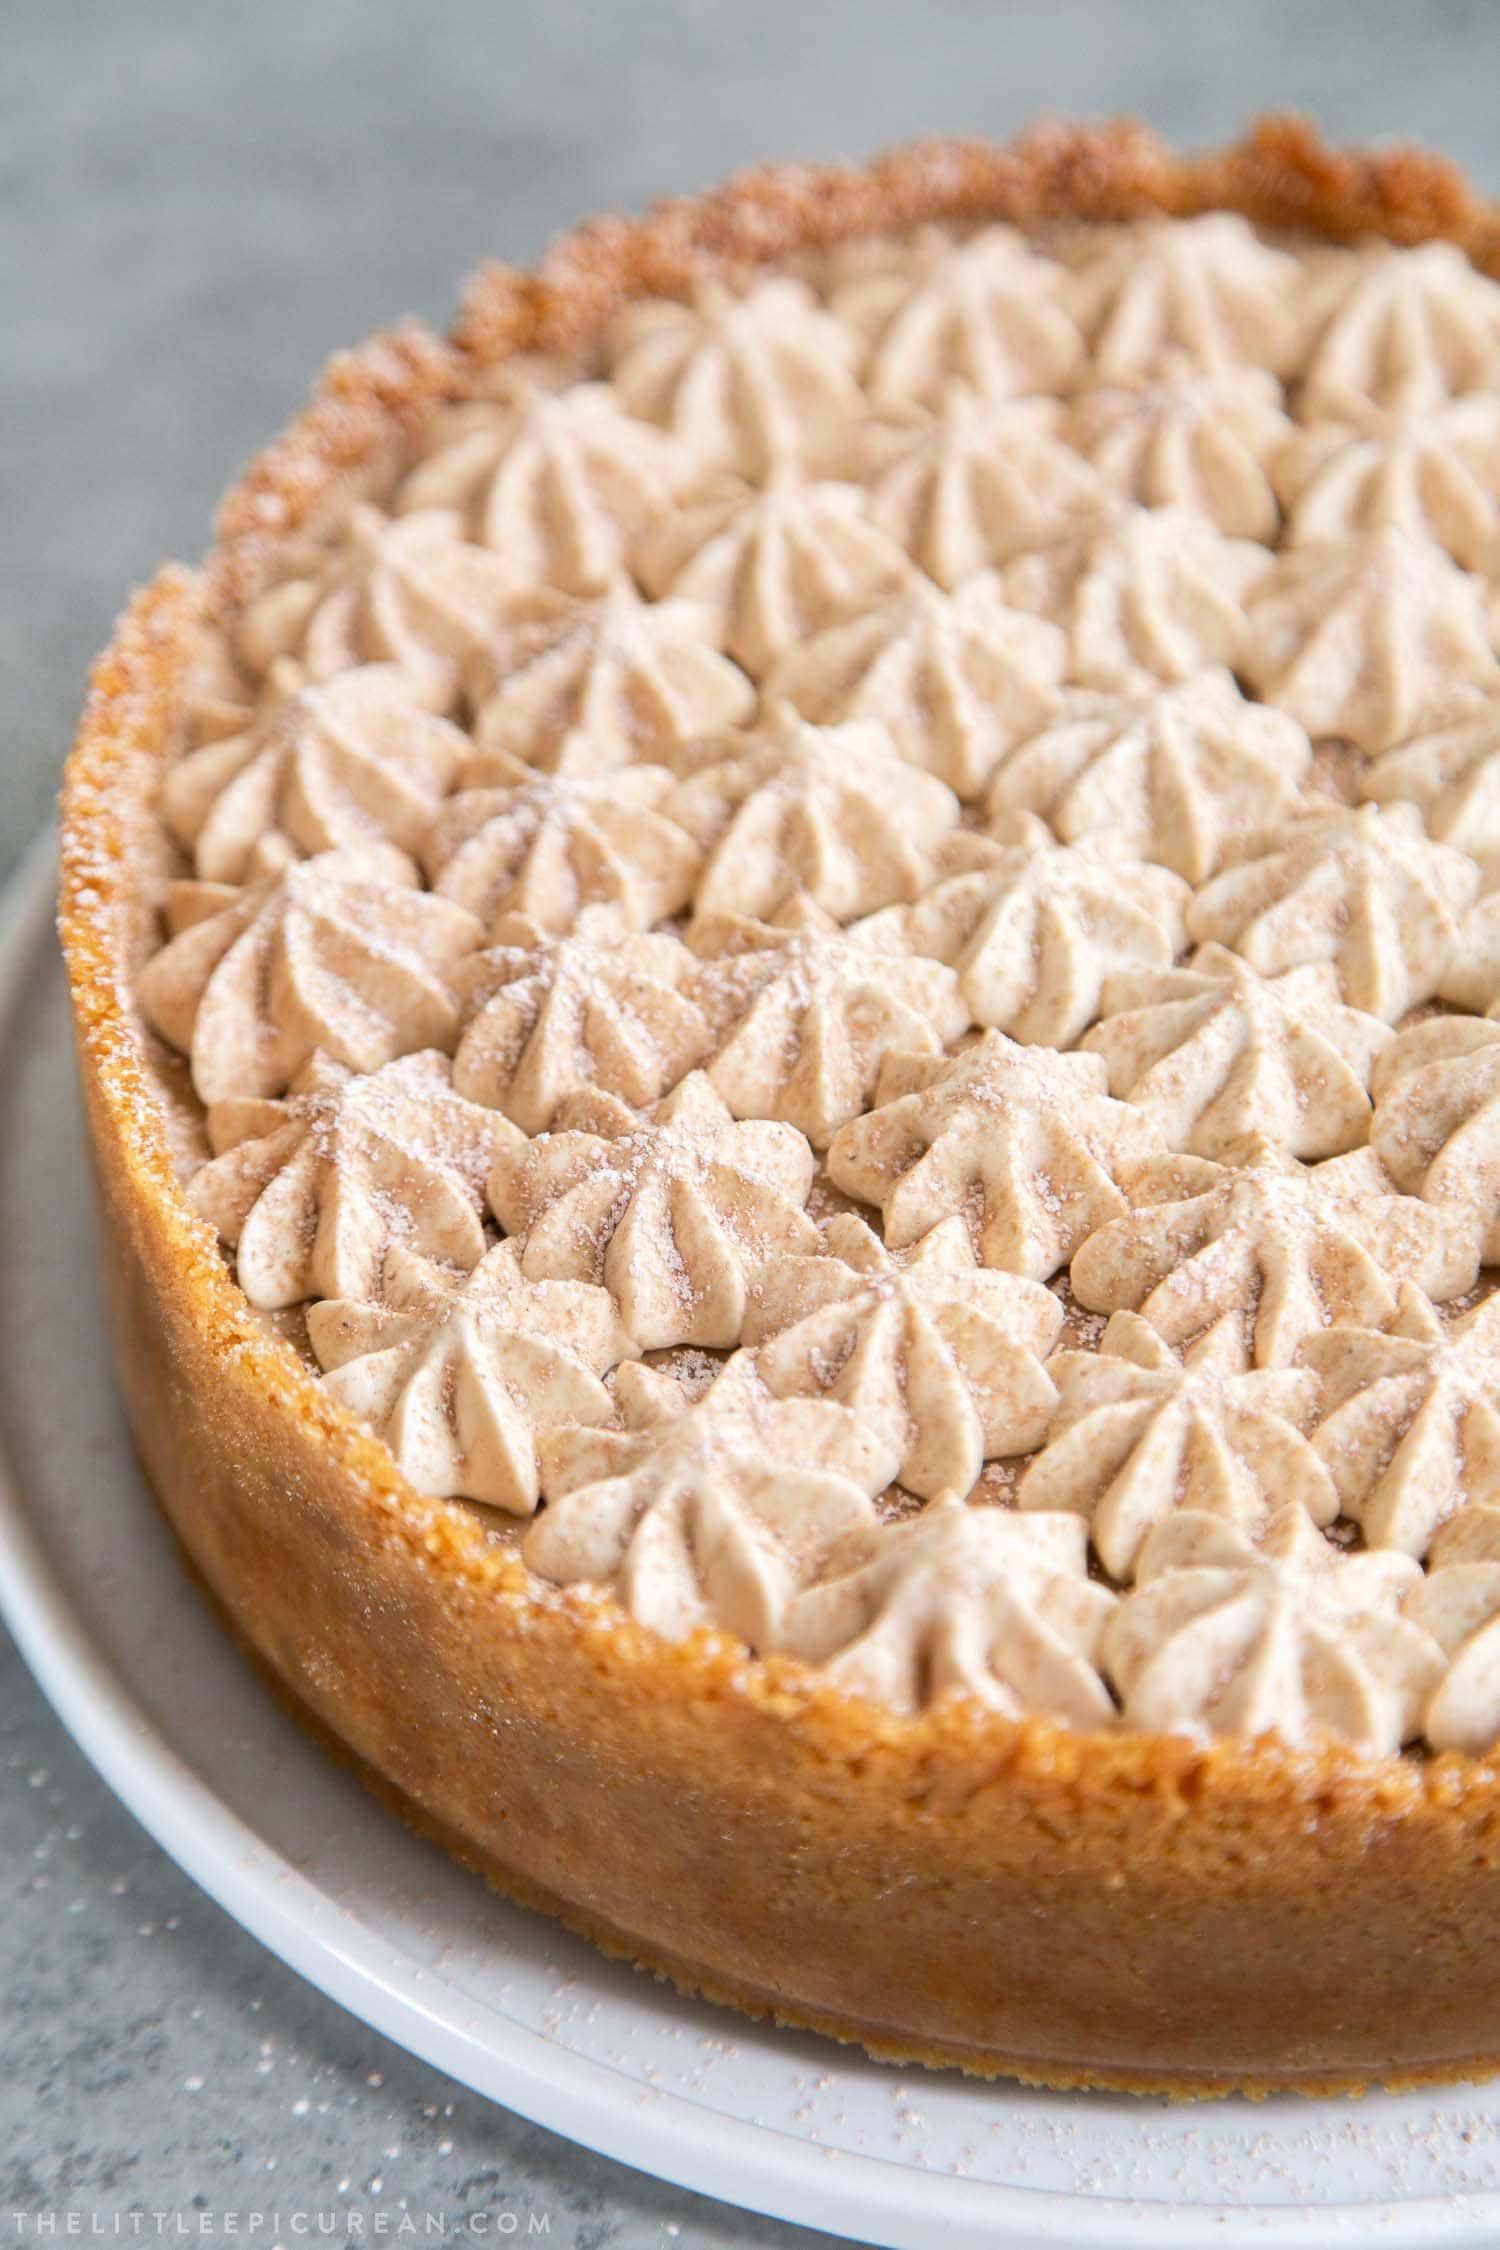 Coffee Mousse Cheesecake. Graham cracker crust, silky cheesecake layer topped with coffee mousse and whipped cream.